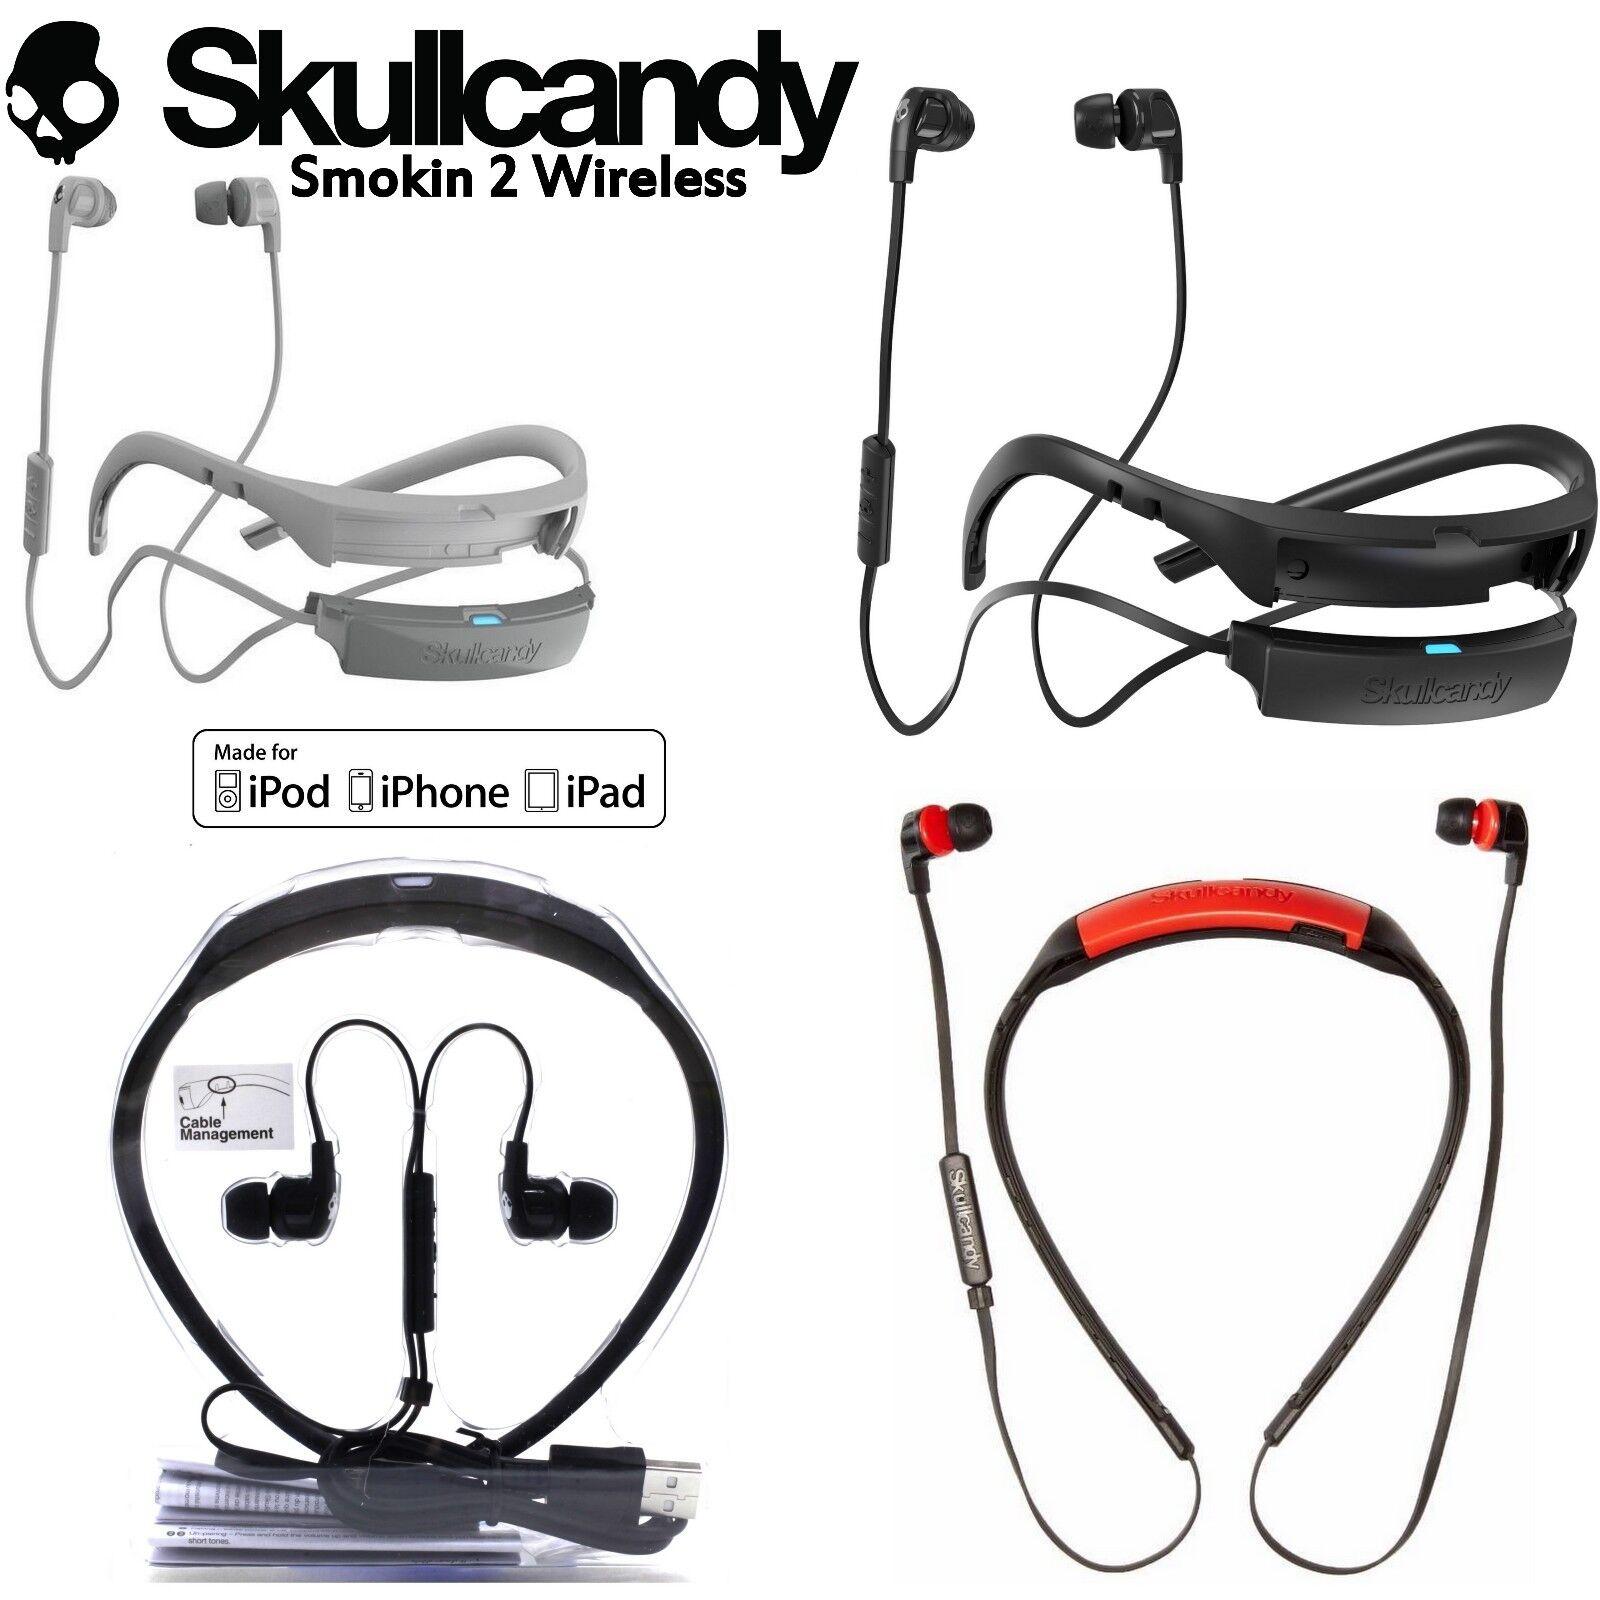 Headphones - Skullcandy SMOKIN BUDS 2 Wireless Bluetooth Earphones with Mic red white New